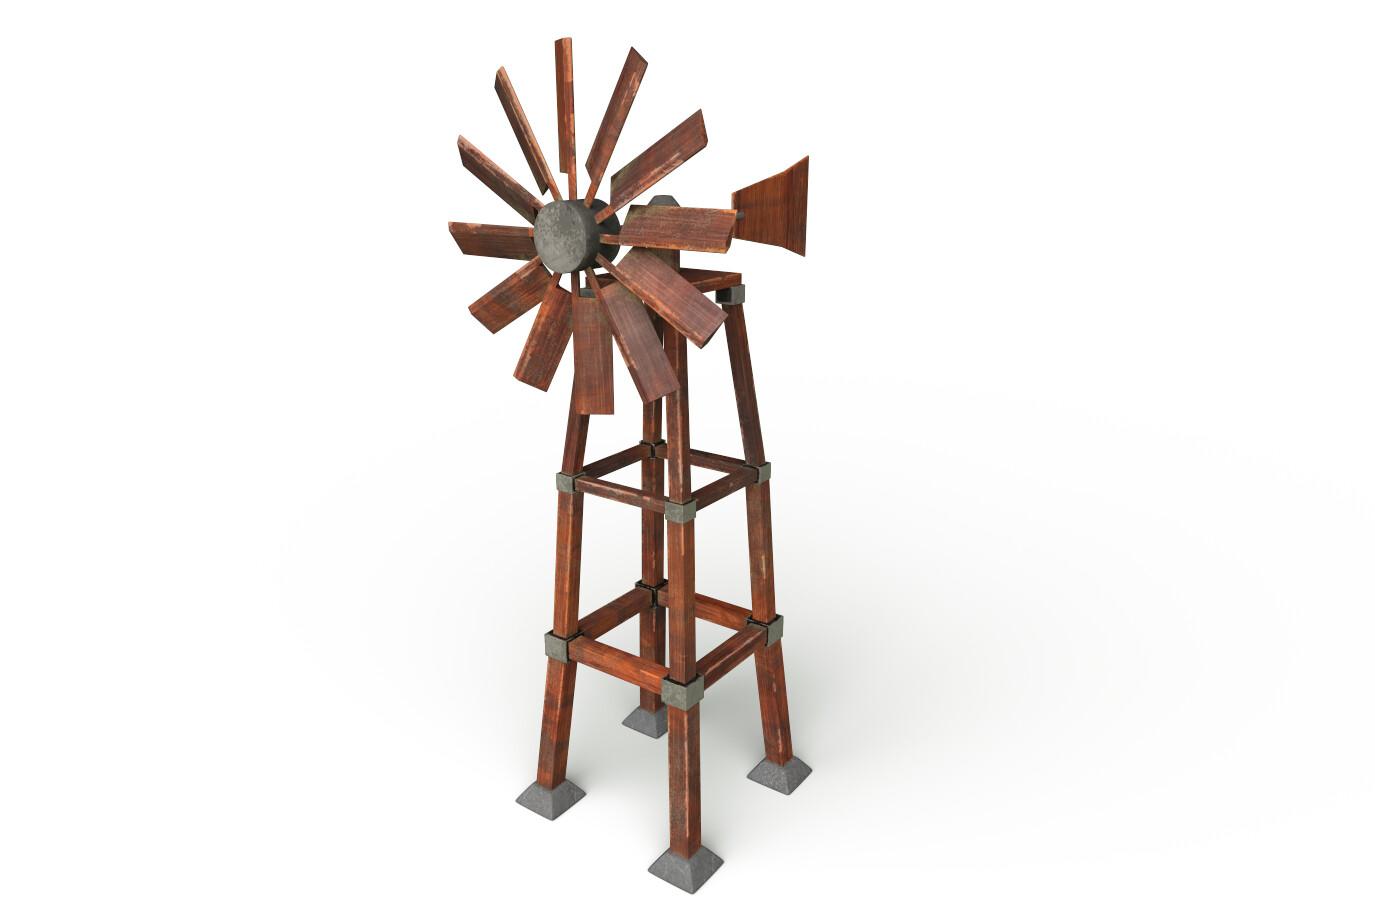 Joseph moniz windmill001i